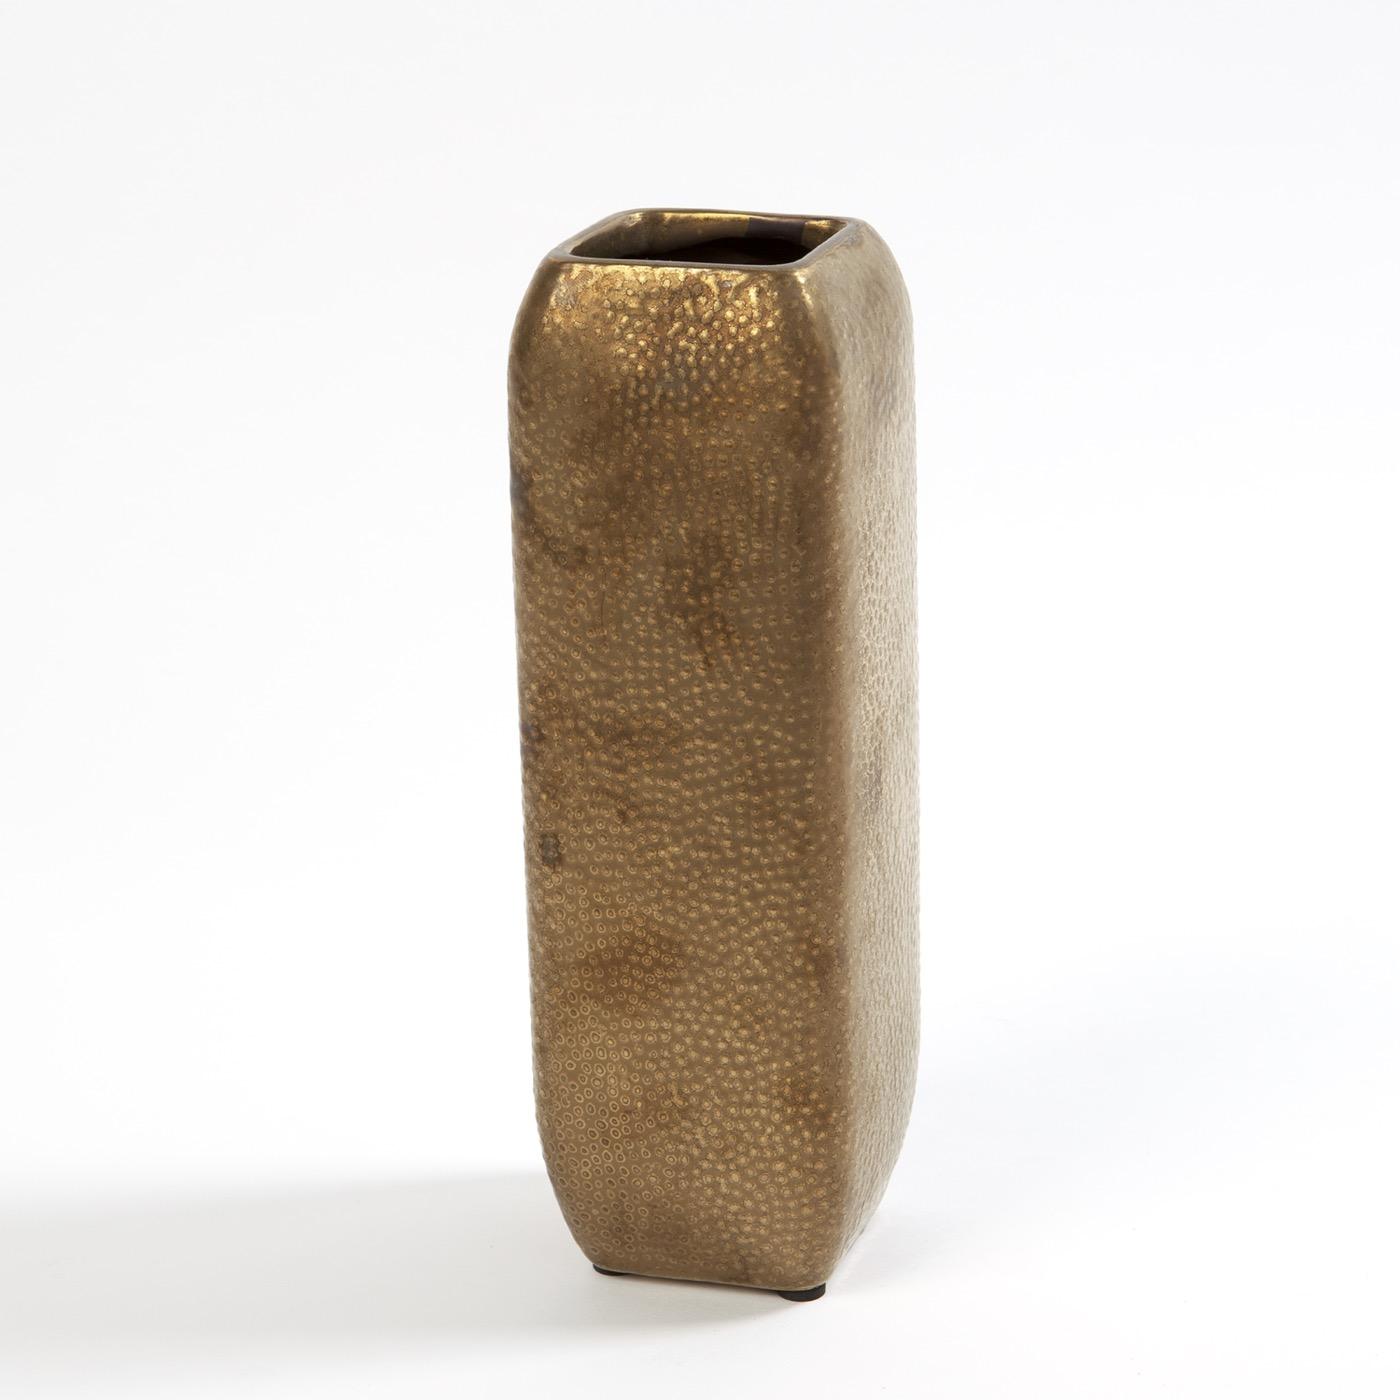 Dean Hammered Ceramic Vases